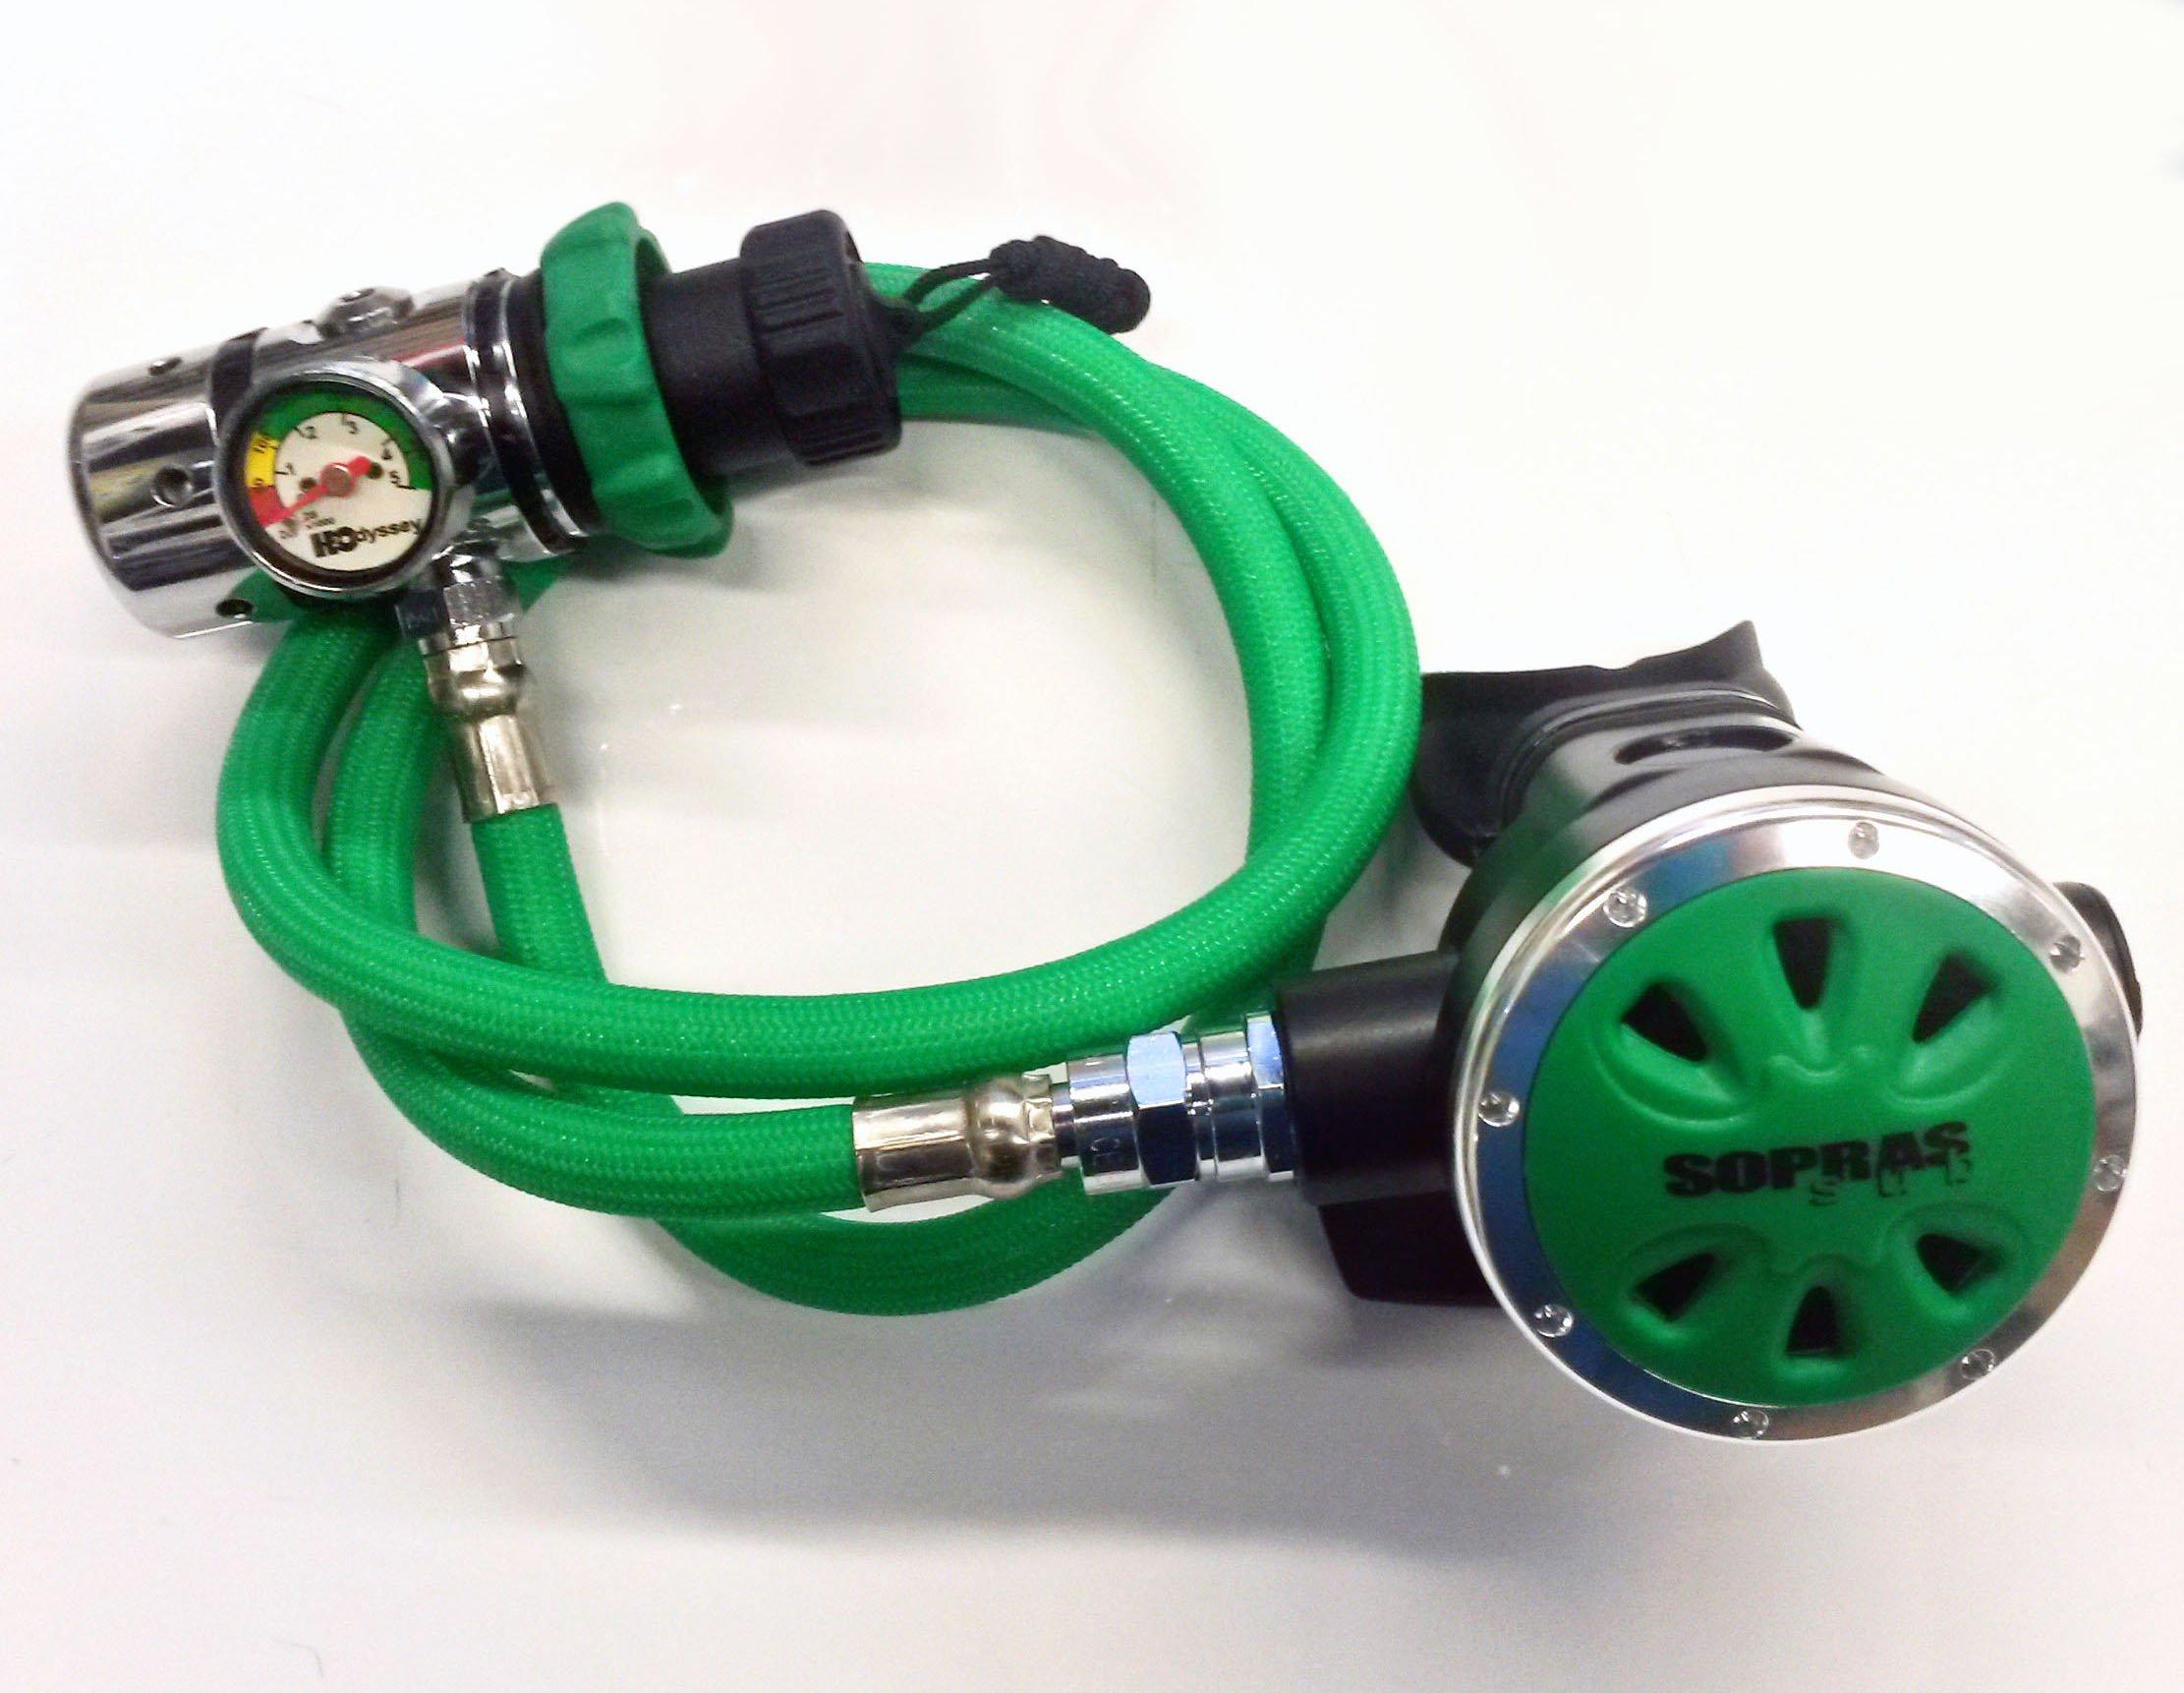 SOPRAS SUB Oxygen Regulator with Flex Hose and Button Gauge O2 Clean Scuba Dive and Technical Diving Reg - Green FREE REGULATOR BAG